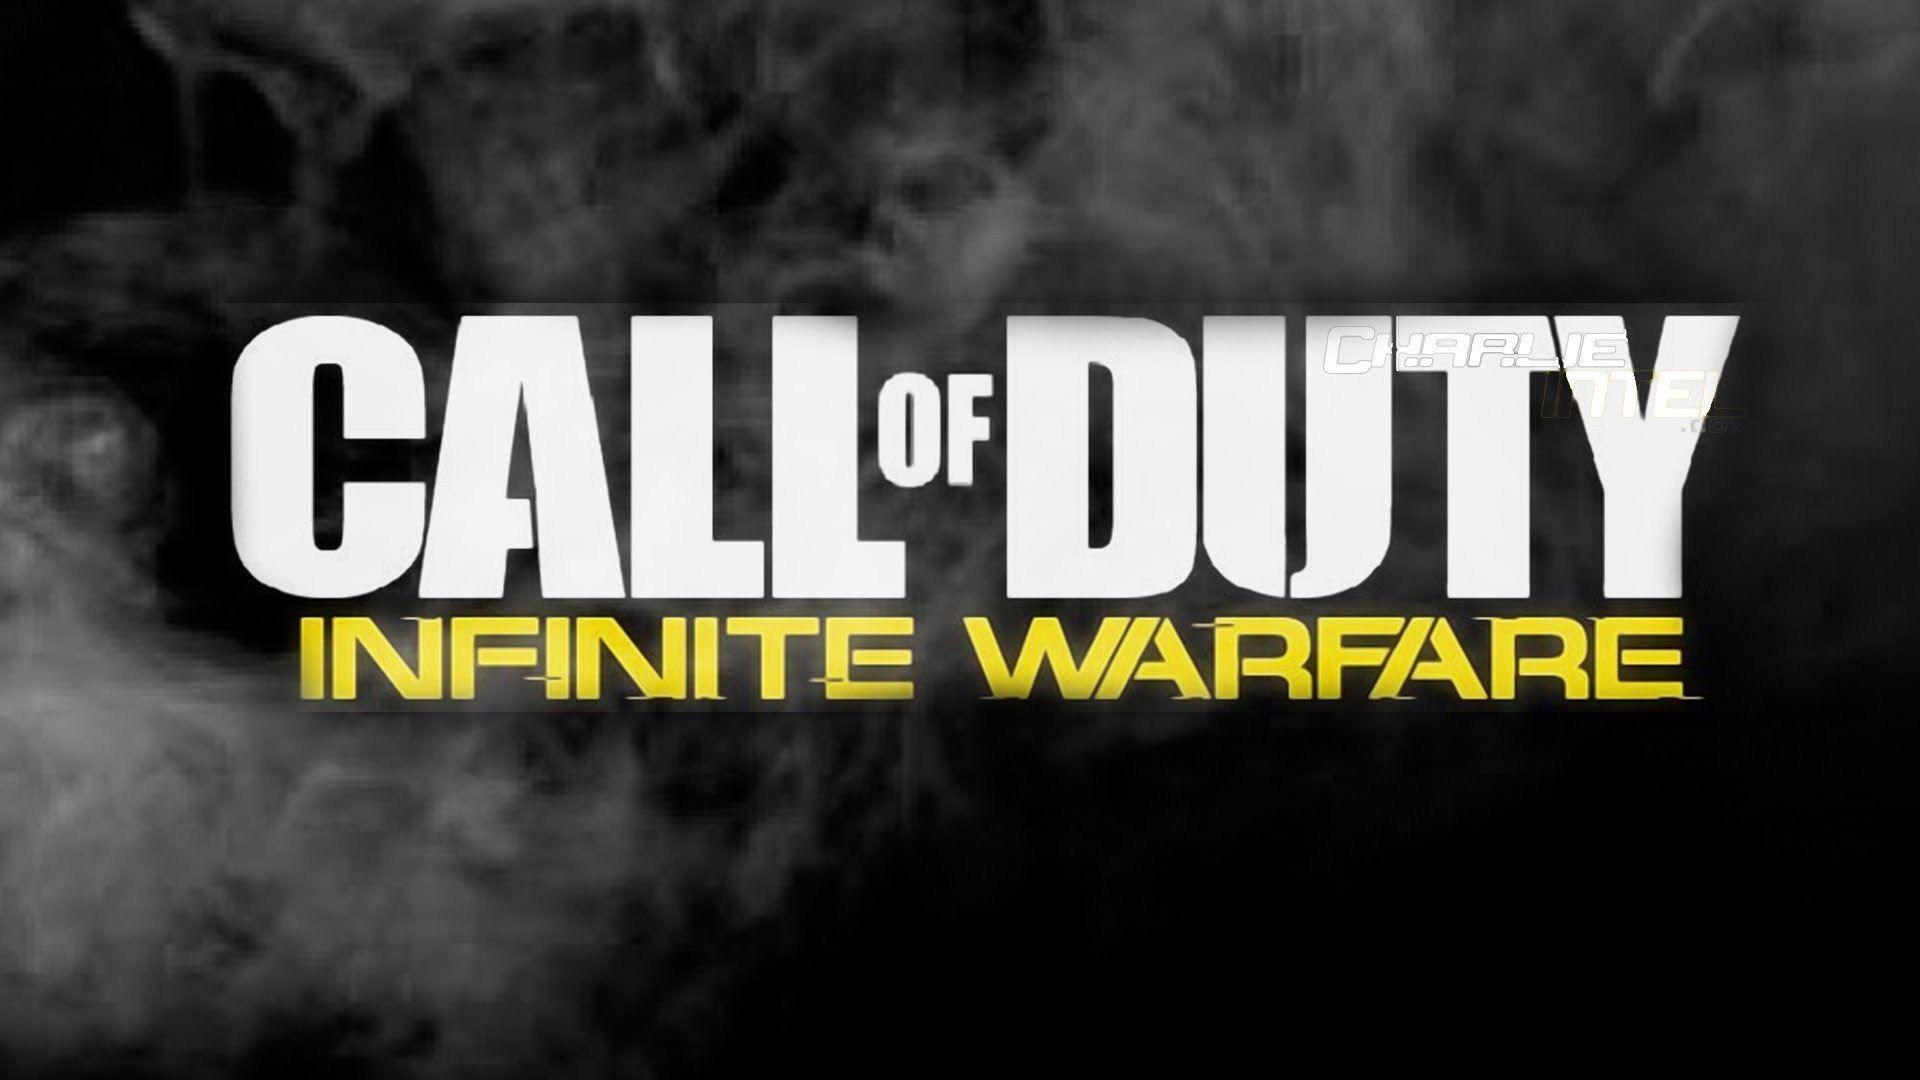 Call Of Duty Infinite Warfare Wallpapers Trumpwallpapers